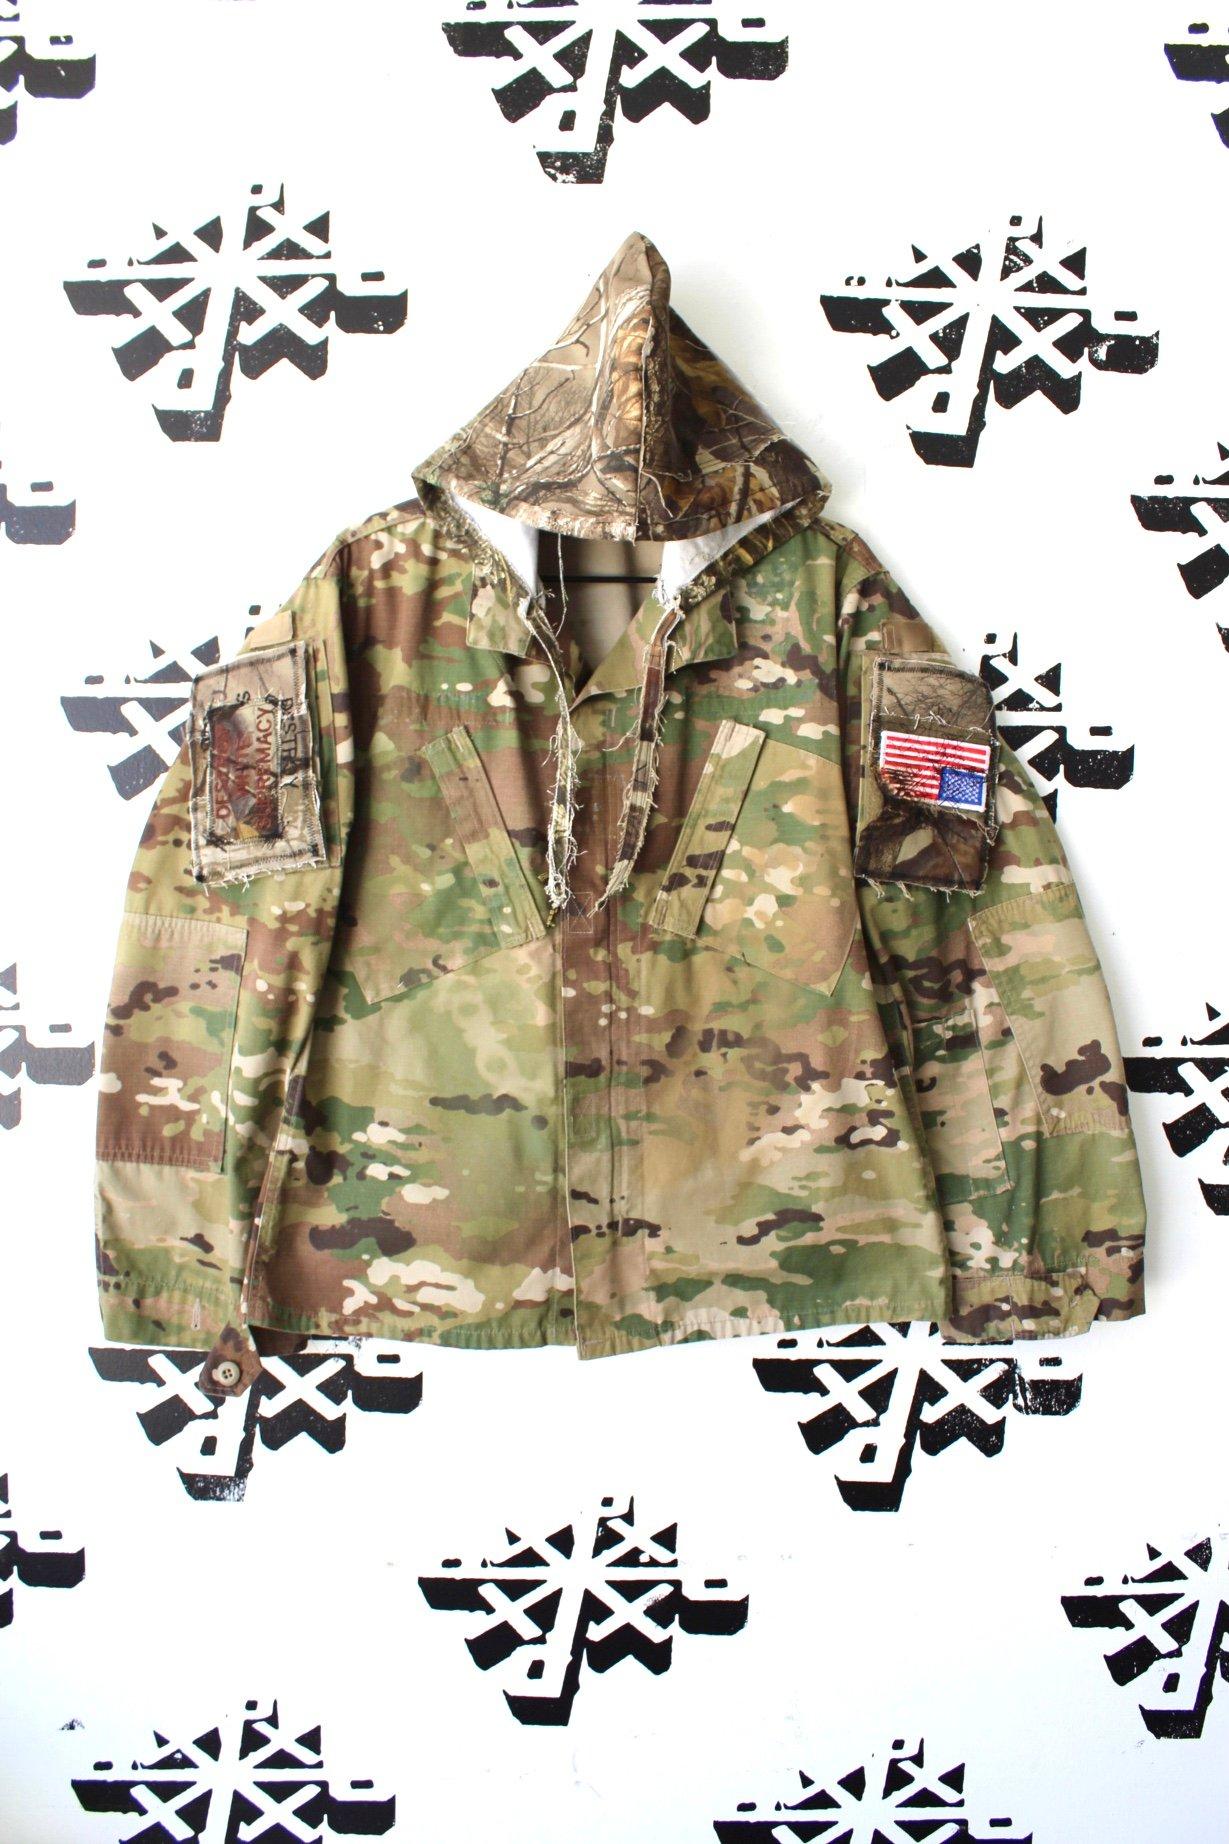 Image of way more tactical custom camo jacket